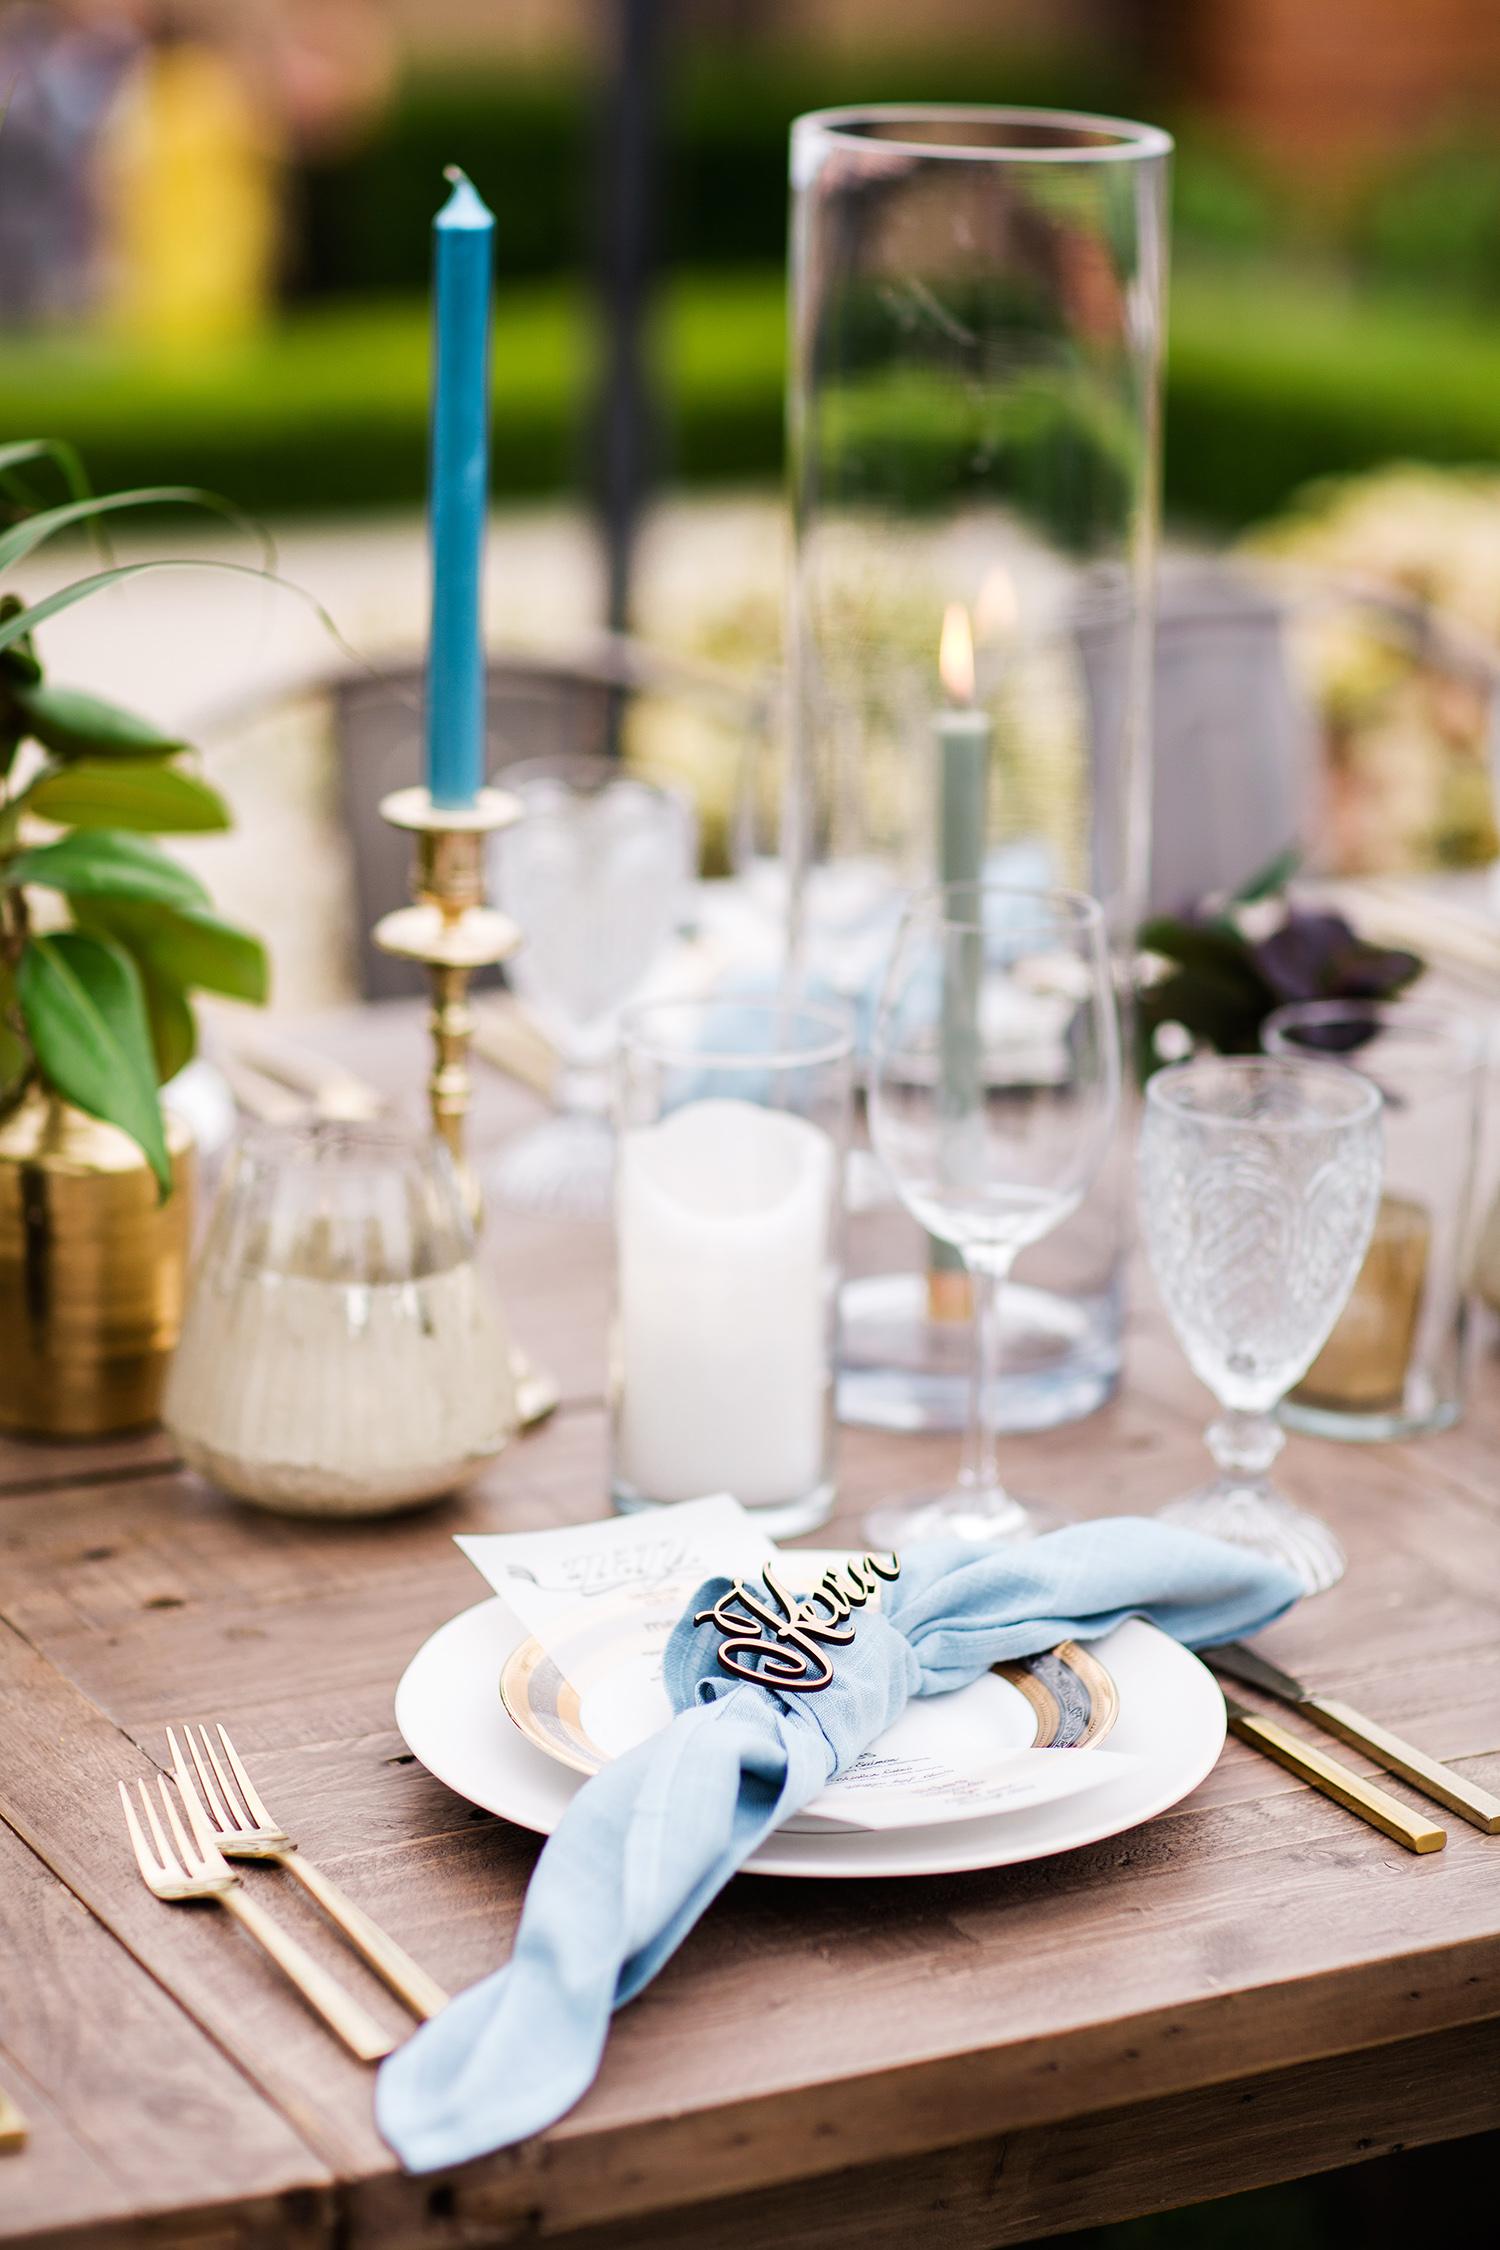 david tim wedding place setting